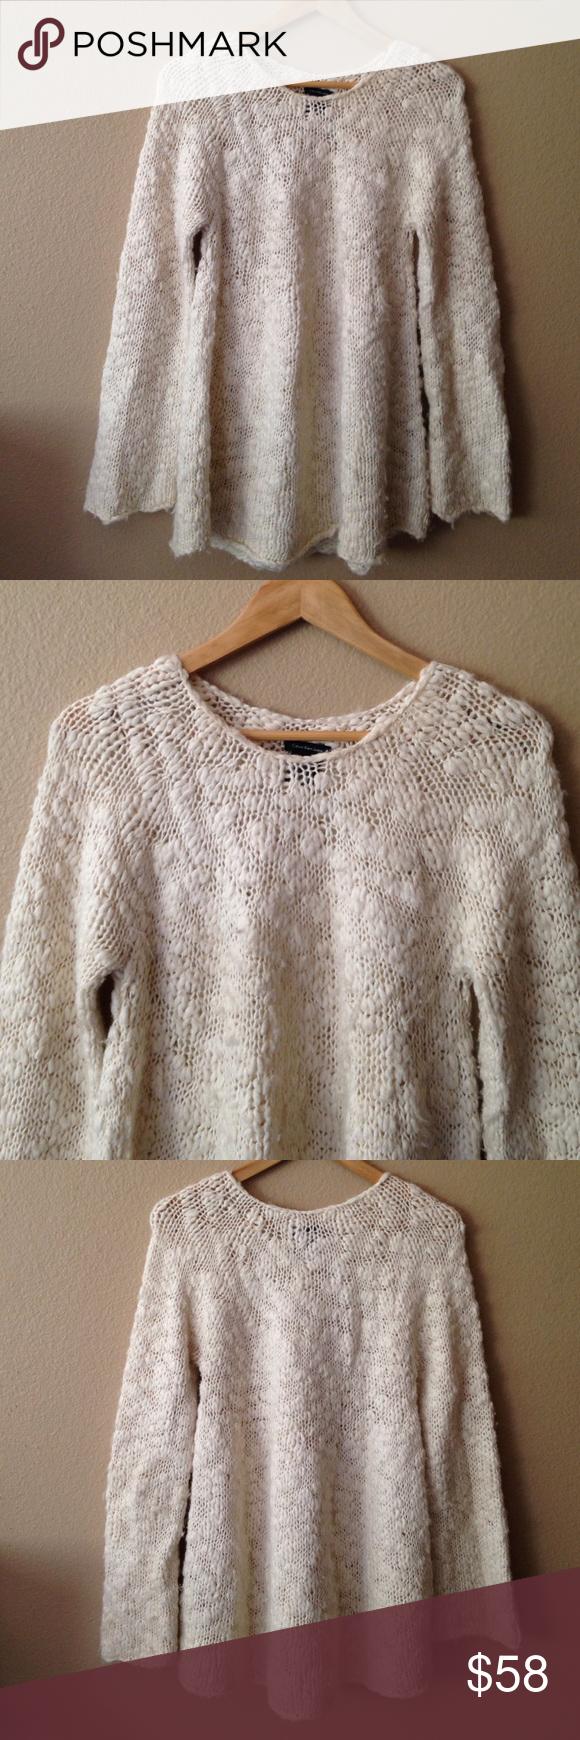 Calvin Klein Chunky Oversized Swing Tunic Sweater Calvin Klein Chunky Oversized Swing Sweater Tunic. Size Large. Wool/Acrylic Blend. Calvin Klein Sweaters Crew & Scoop Necks